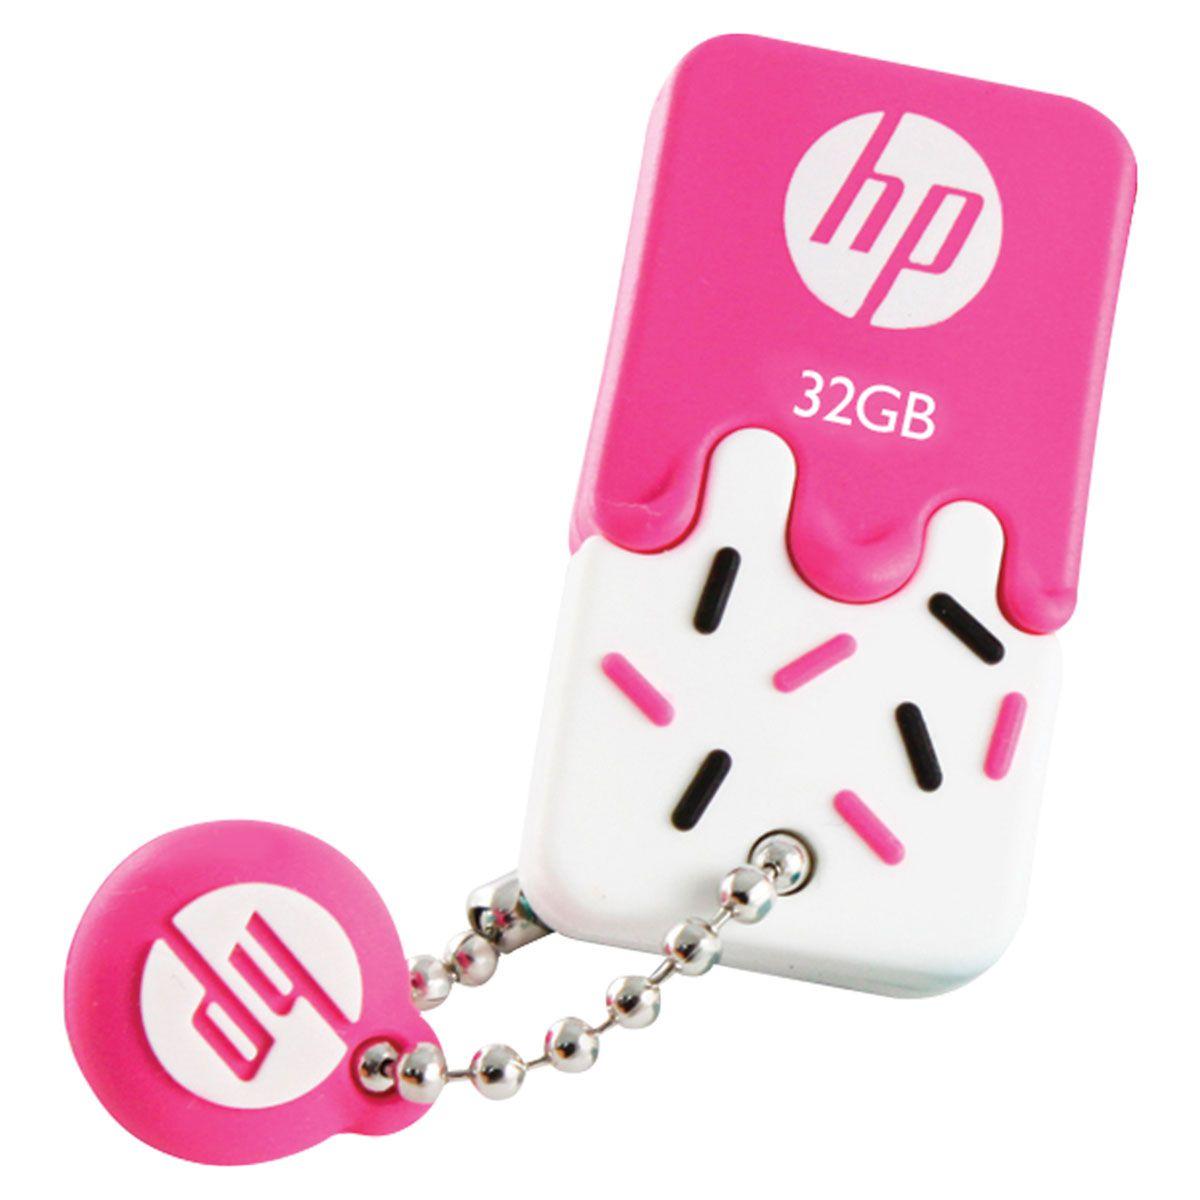 Pen Drive Mini HP USB 2.0 V178P 32GB PINK HPFD178P-32